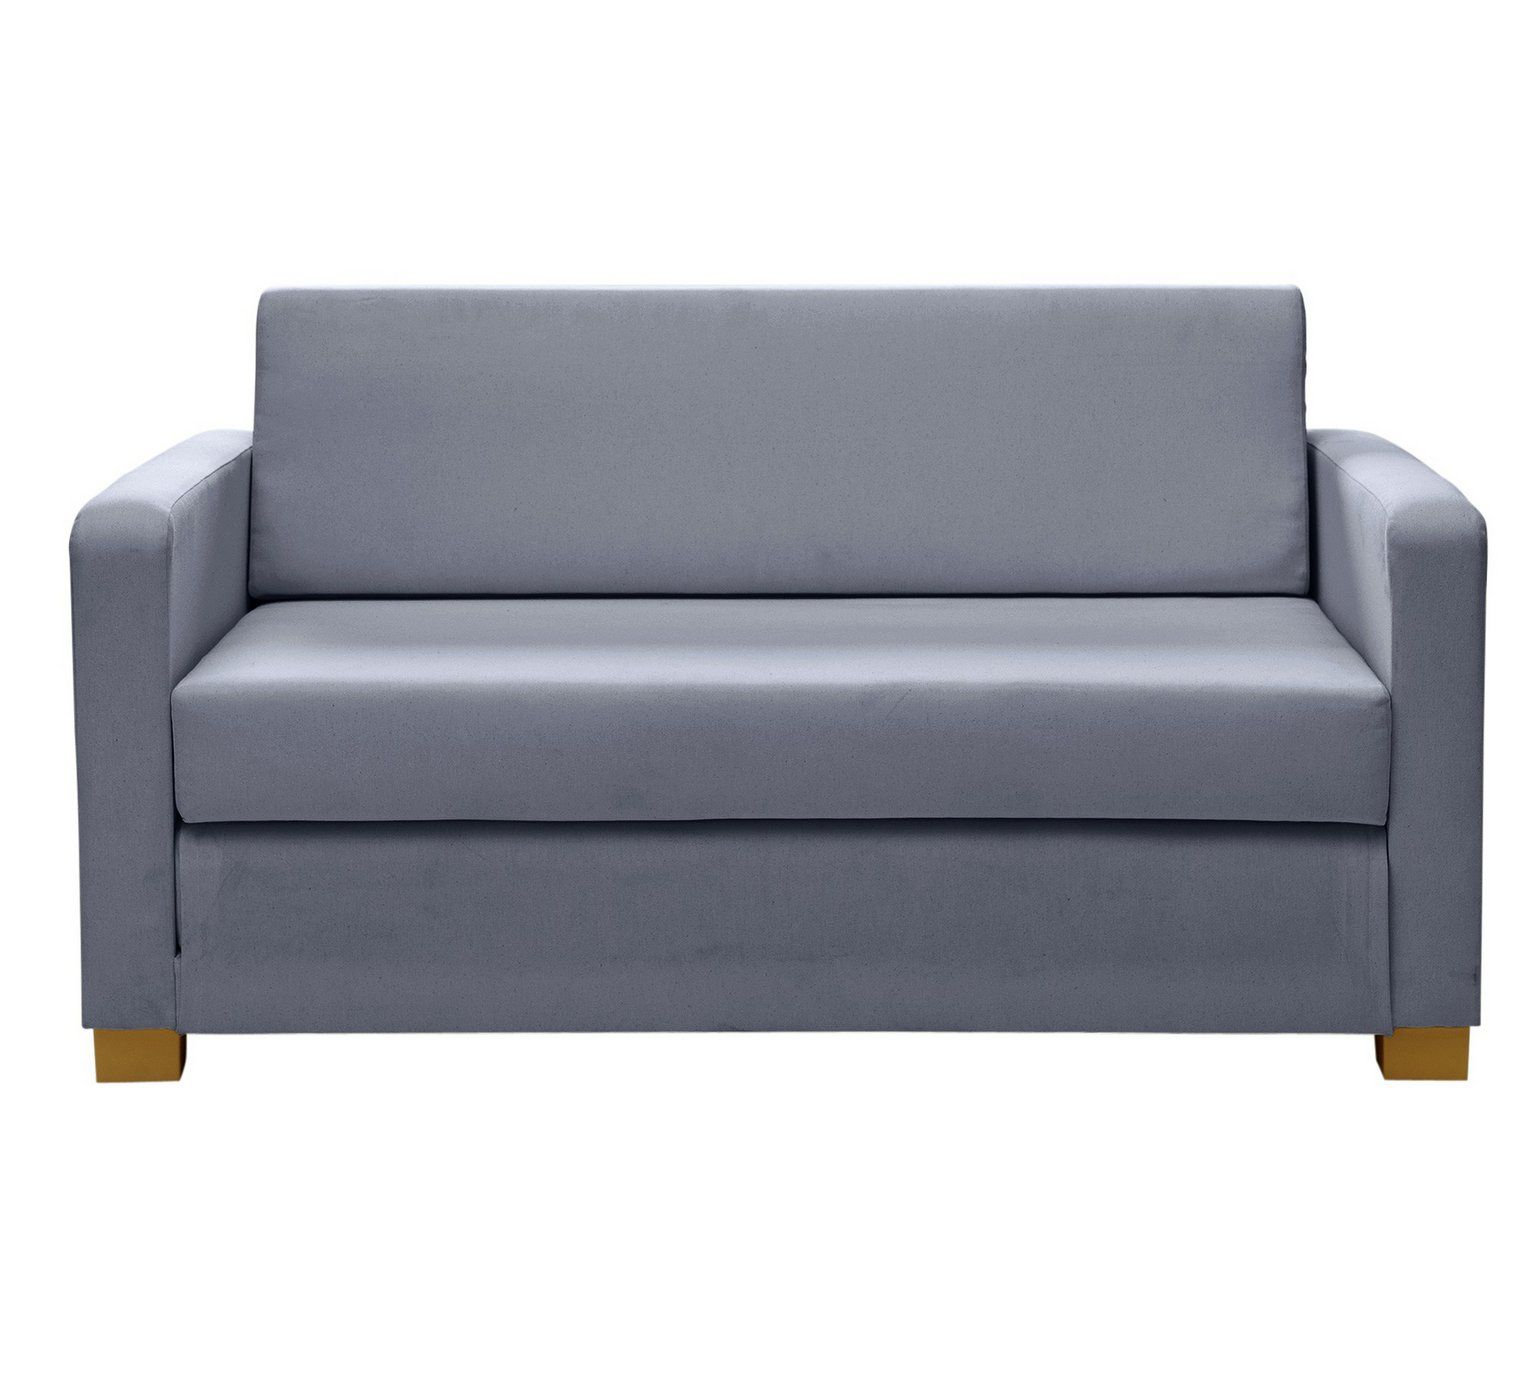 Corner Sofa Bed Uk Argos Queen Size Low Profile Sleeper Sheet Set The 25 43 Best Ideas On Pinterest